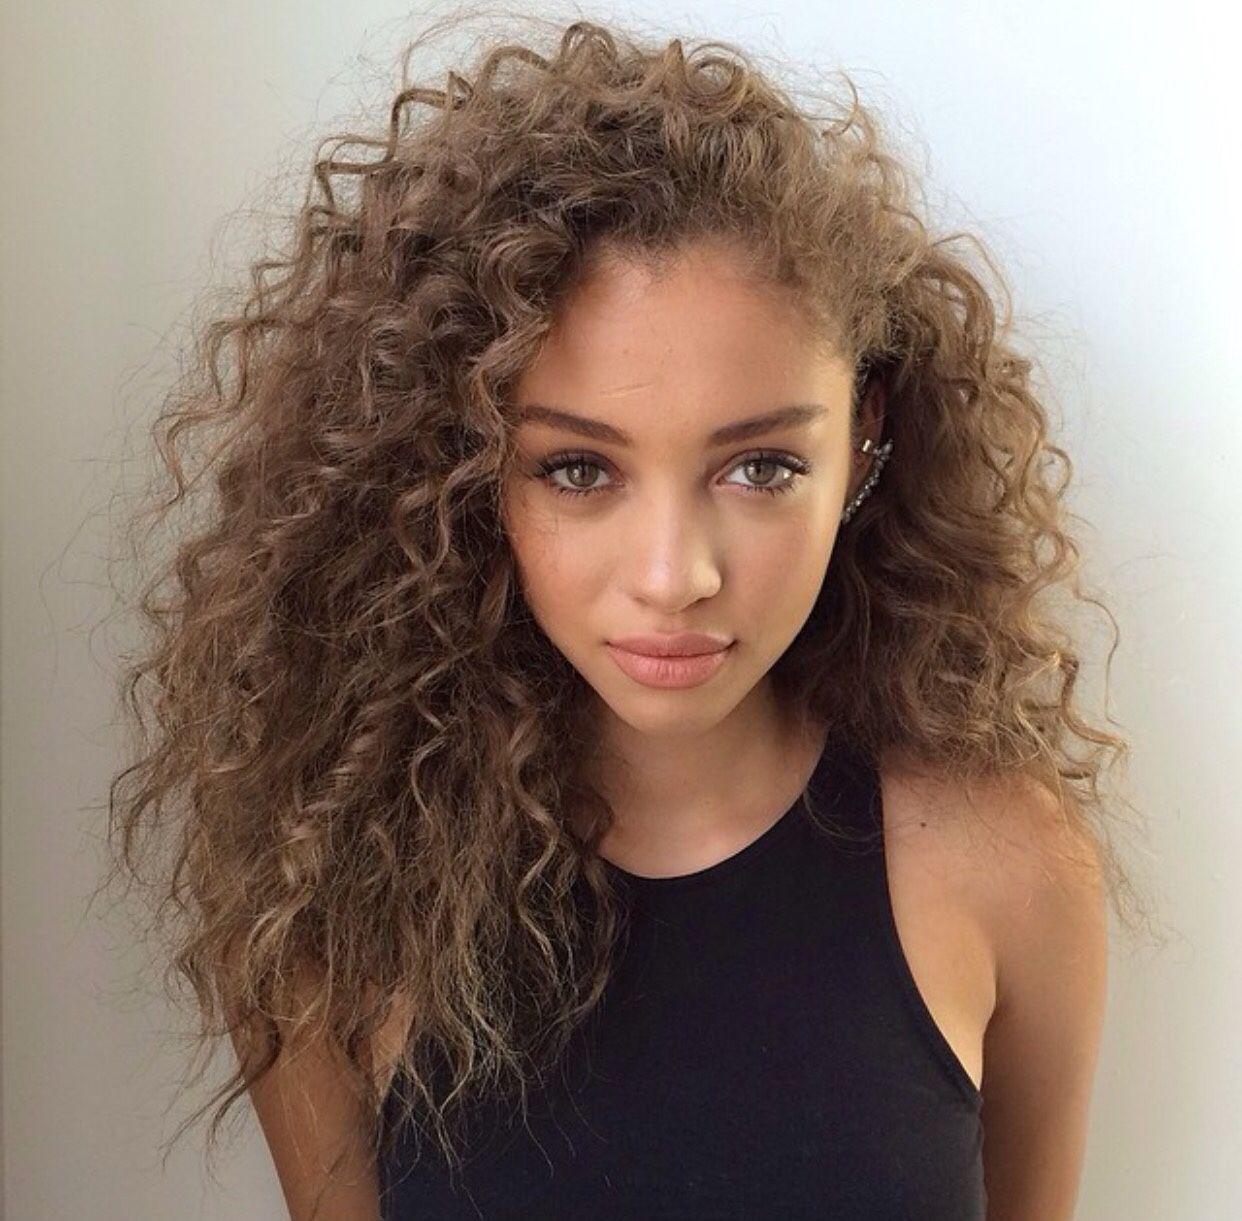 Human Hair Wigs With Baby Hair For Black Women Glueless Virgin Brazilian Hair Curly Hair Styles Long Hair Styles Hair Styles